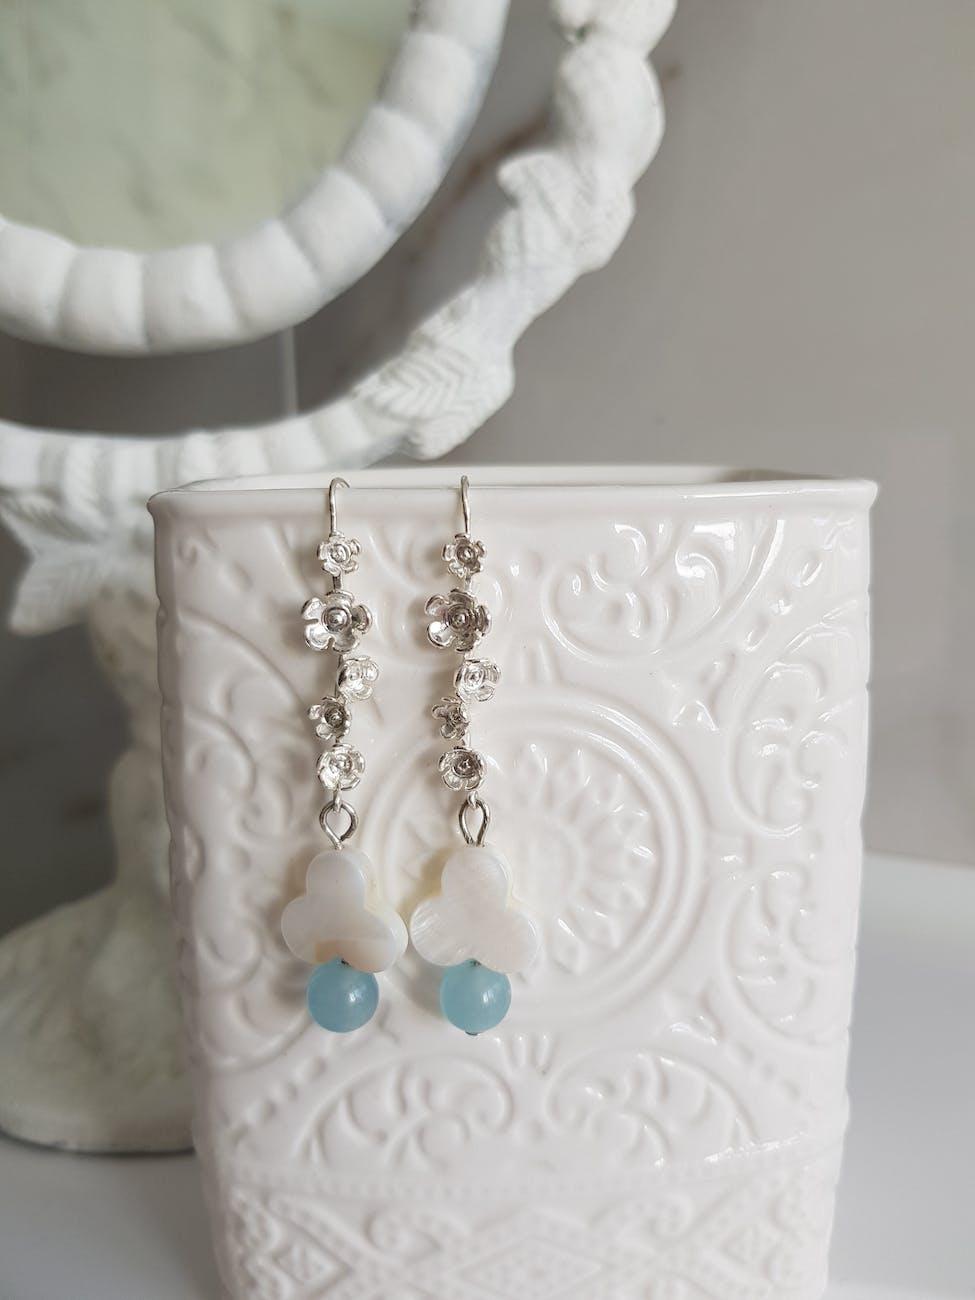 Floral Patterned Earrings